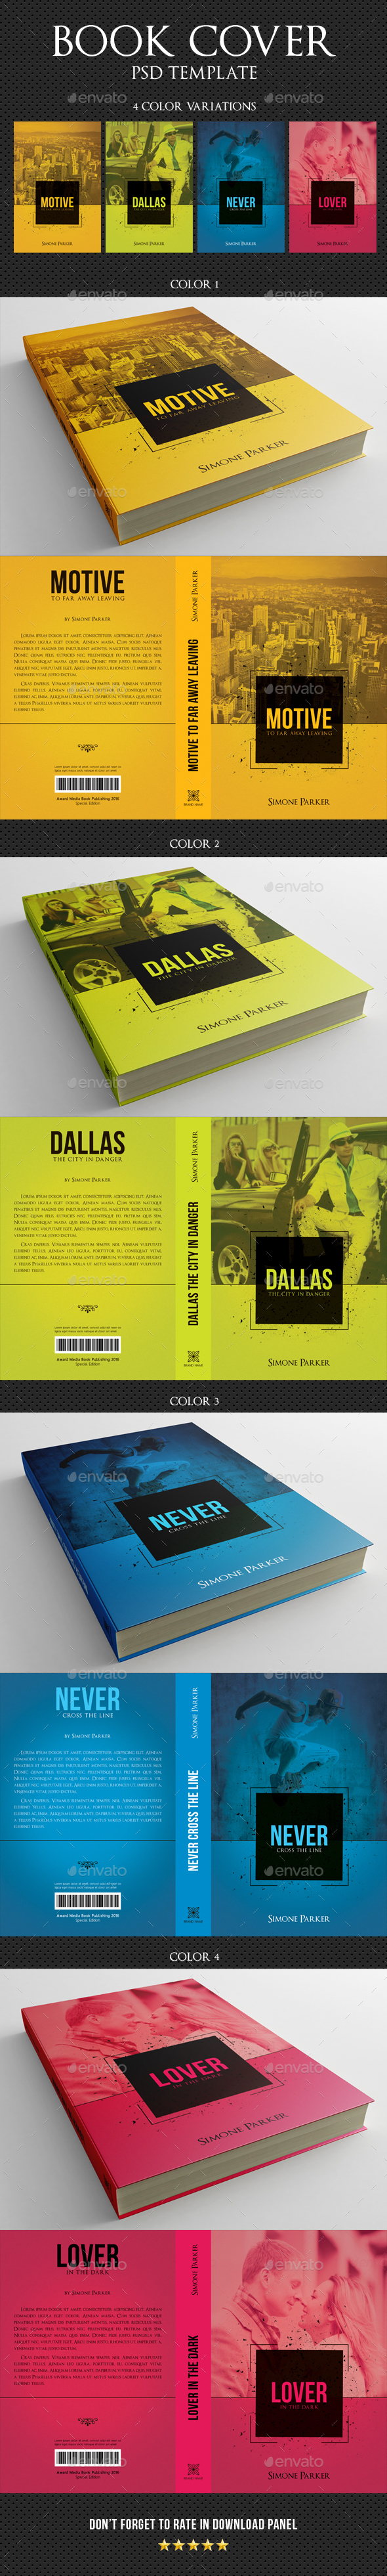 Book Cover Graphicriver : Book cover template by rapidgraf graphicriver